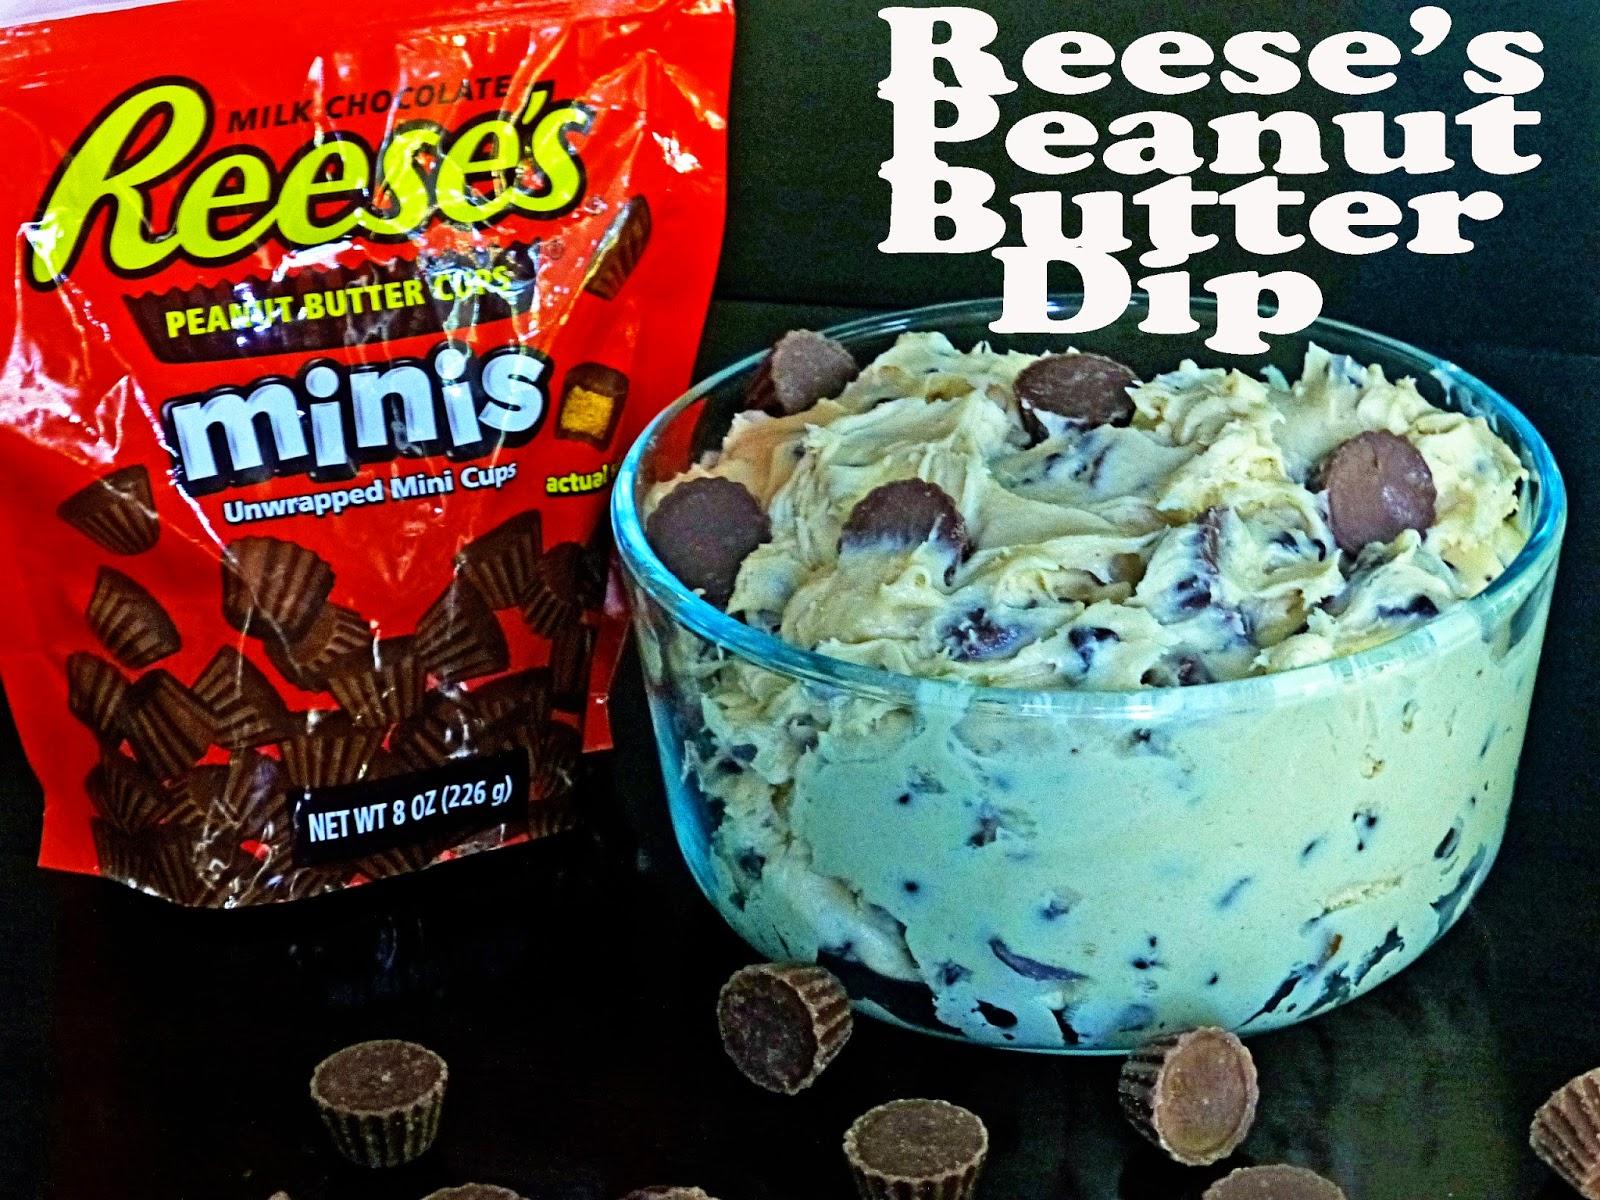 Reese's Peanut Butter Dip